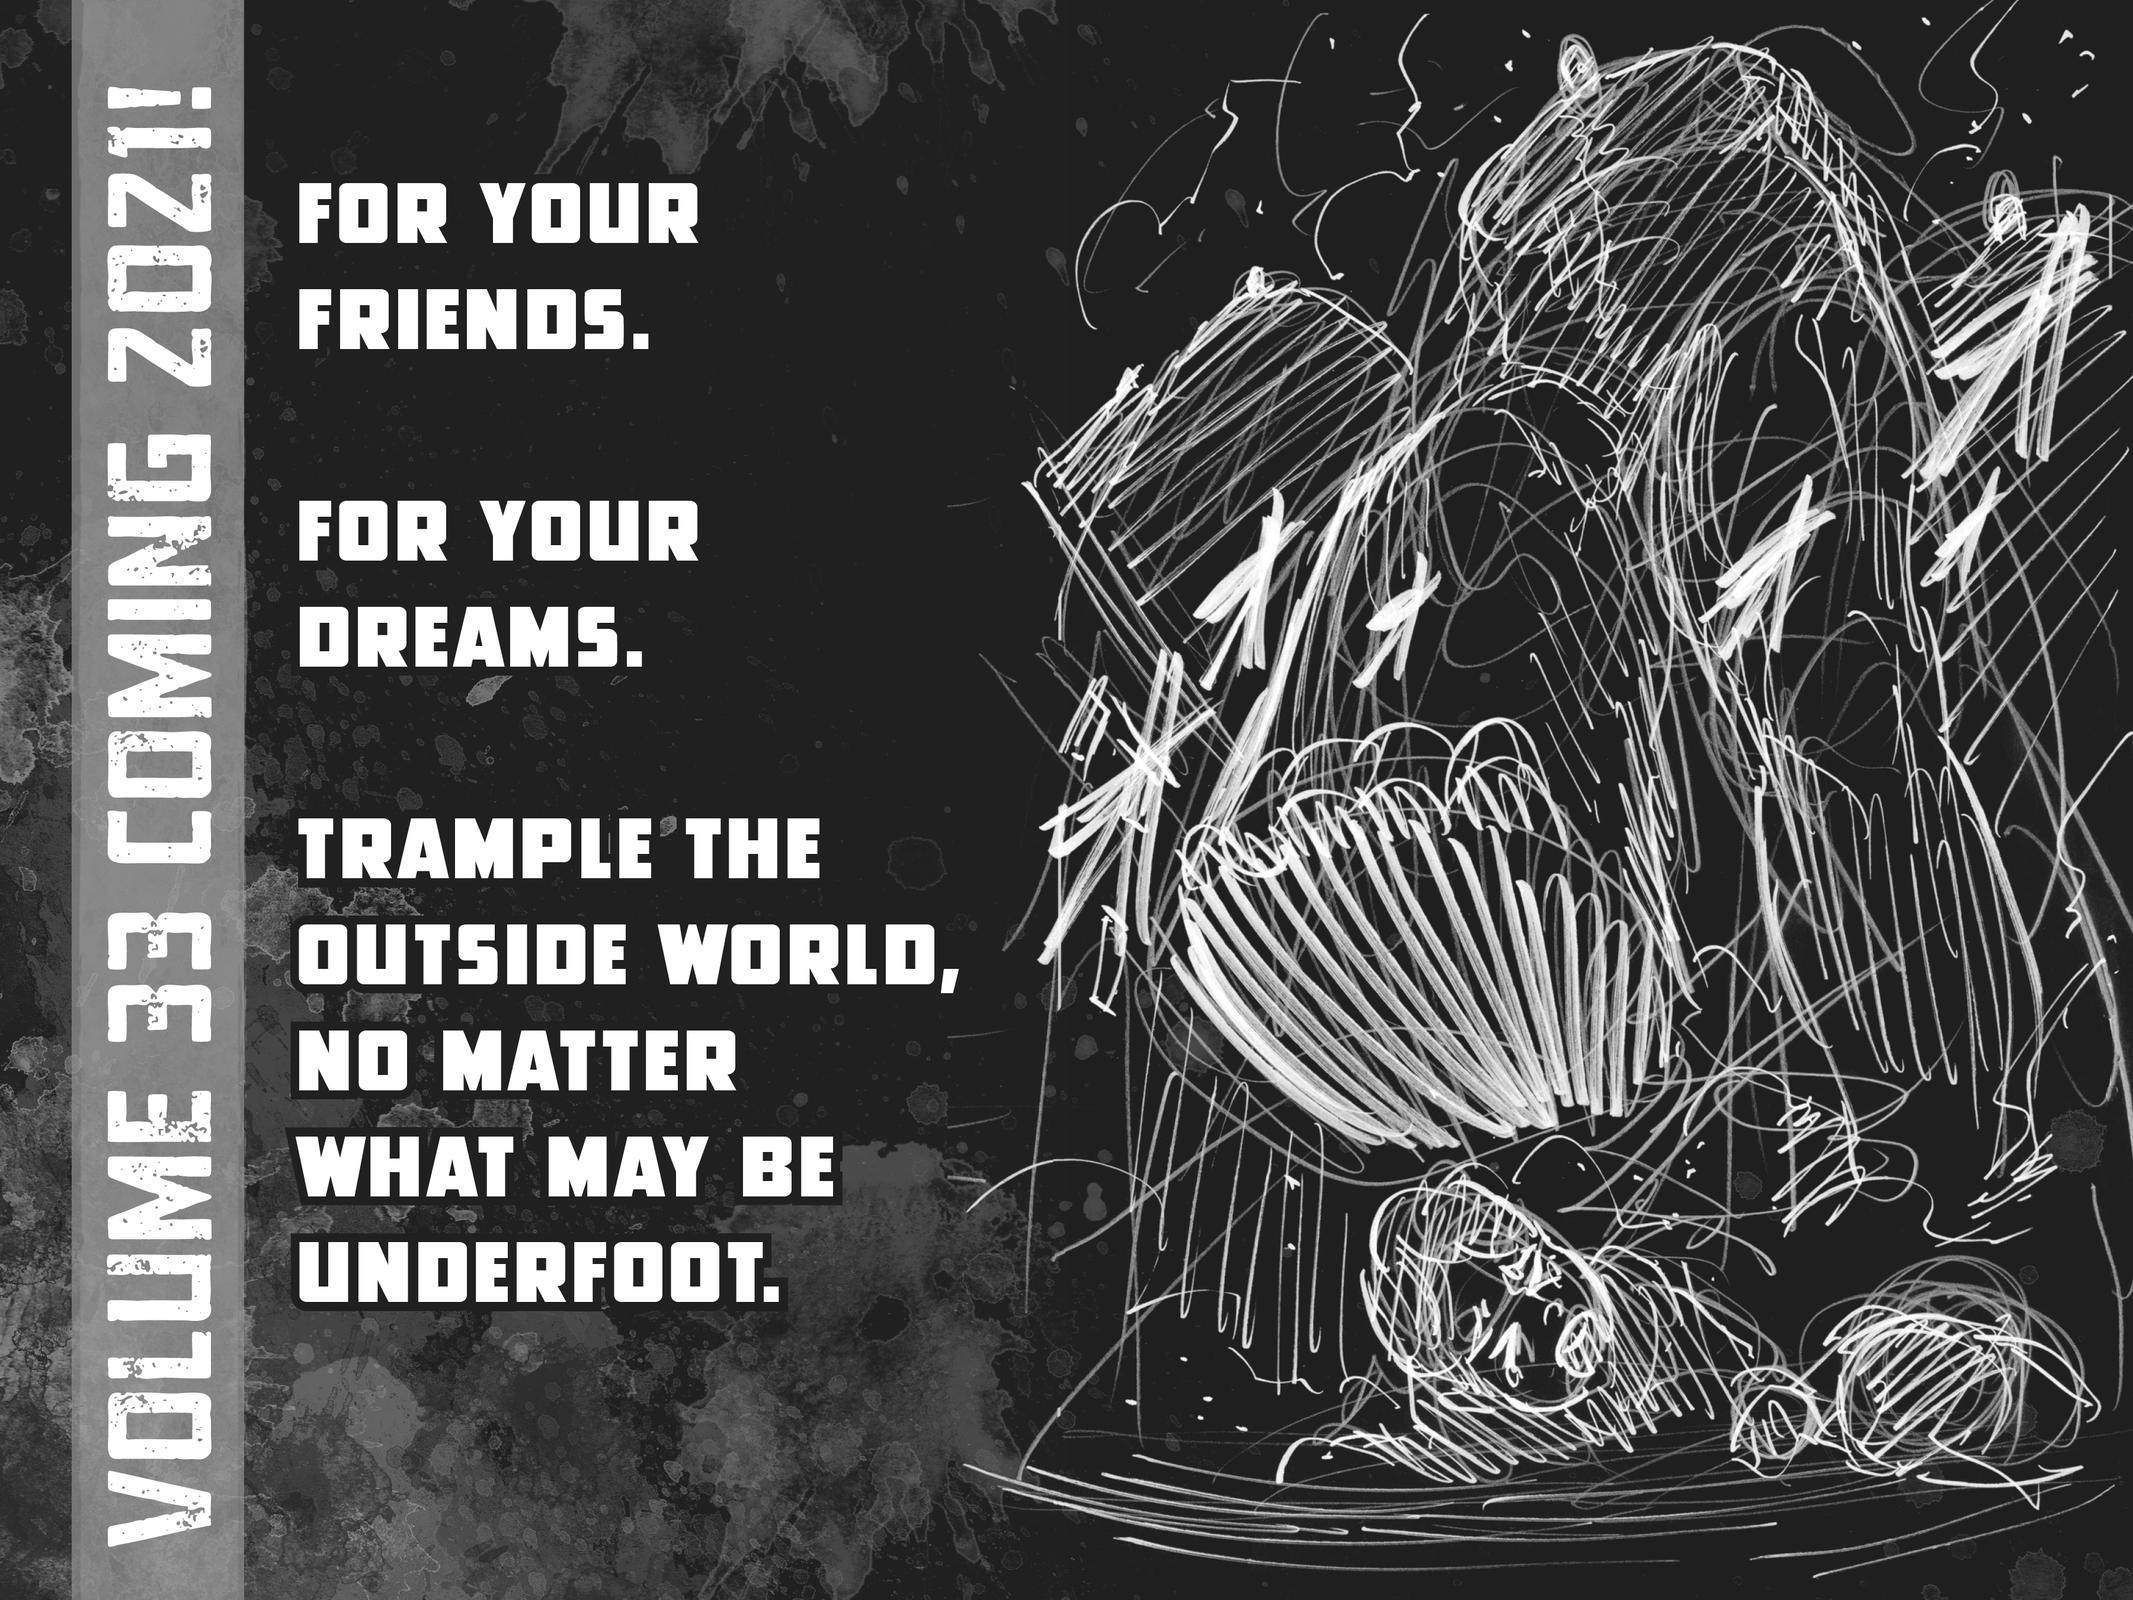 Attack On Titan, Episode 130 image 038